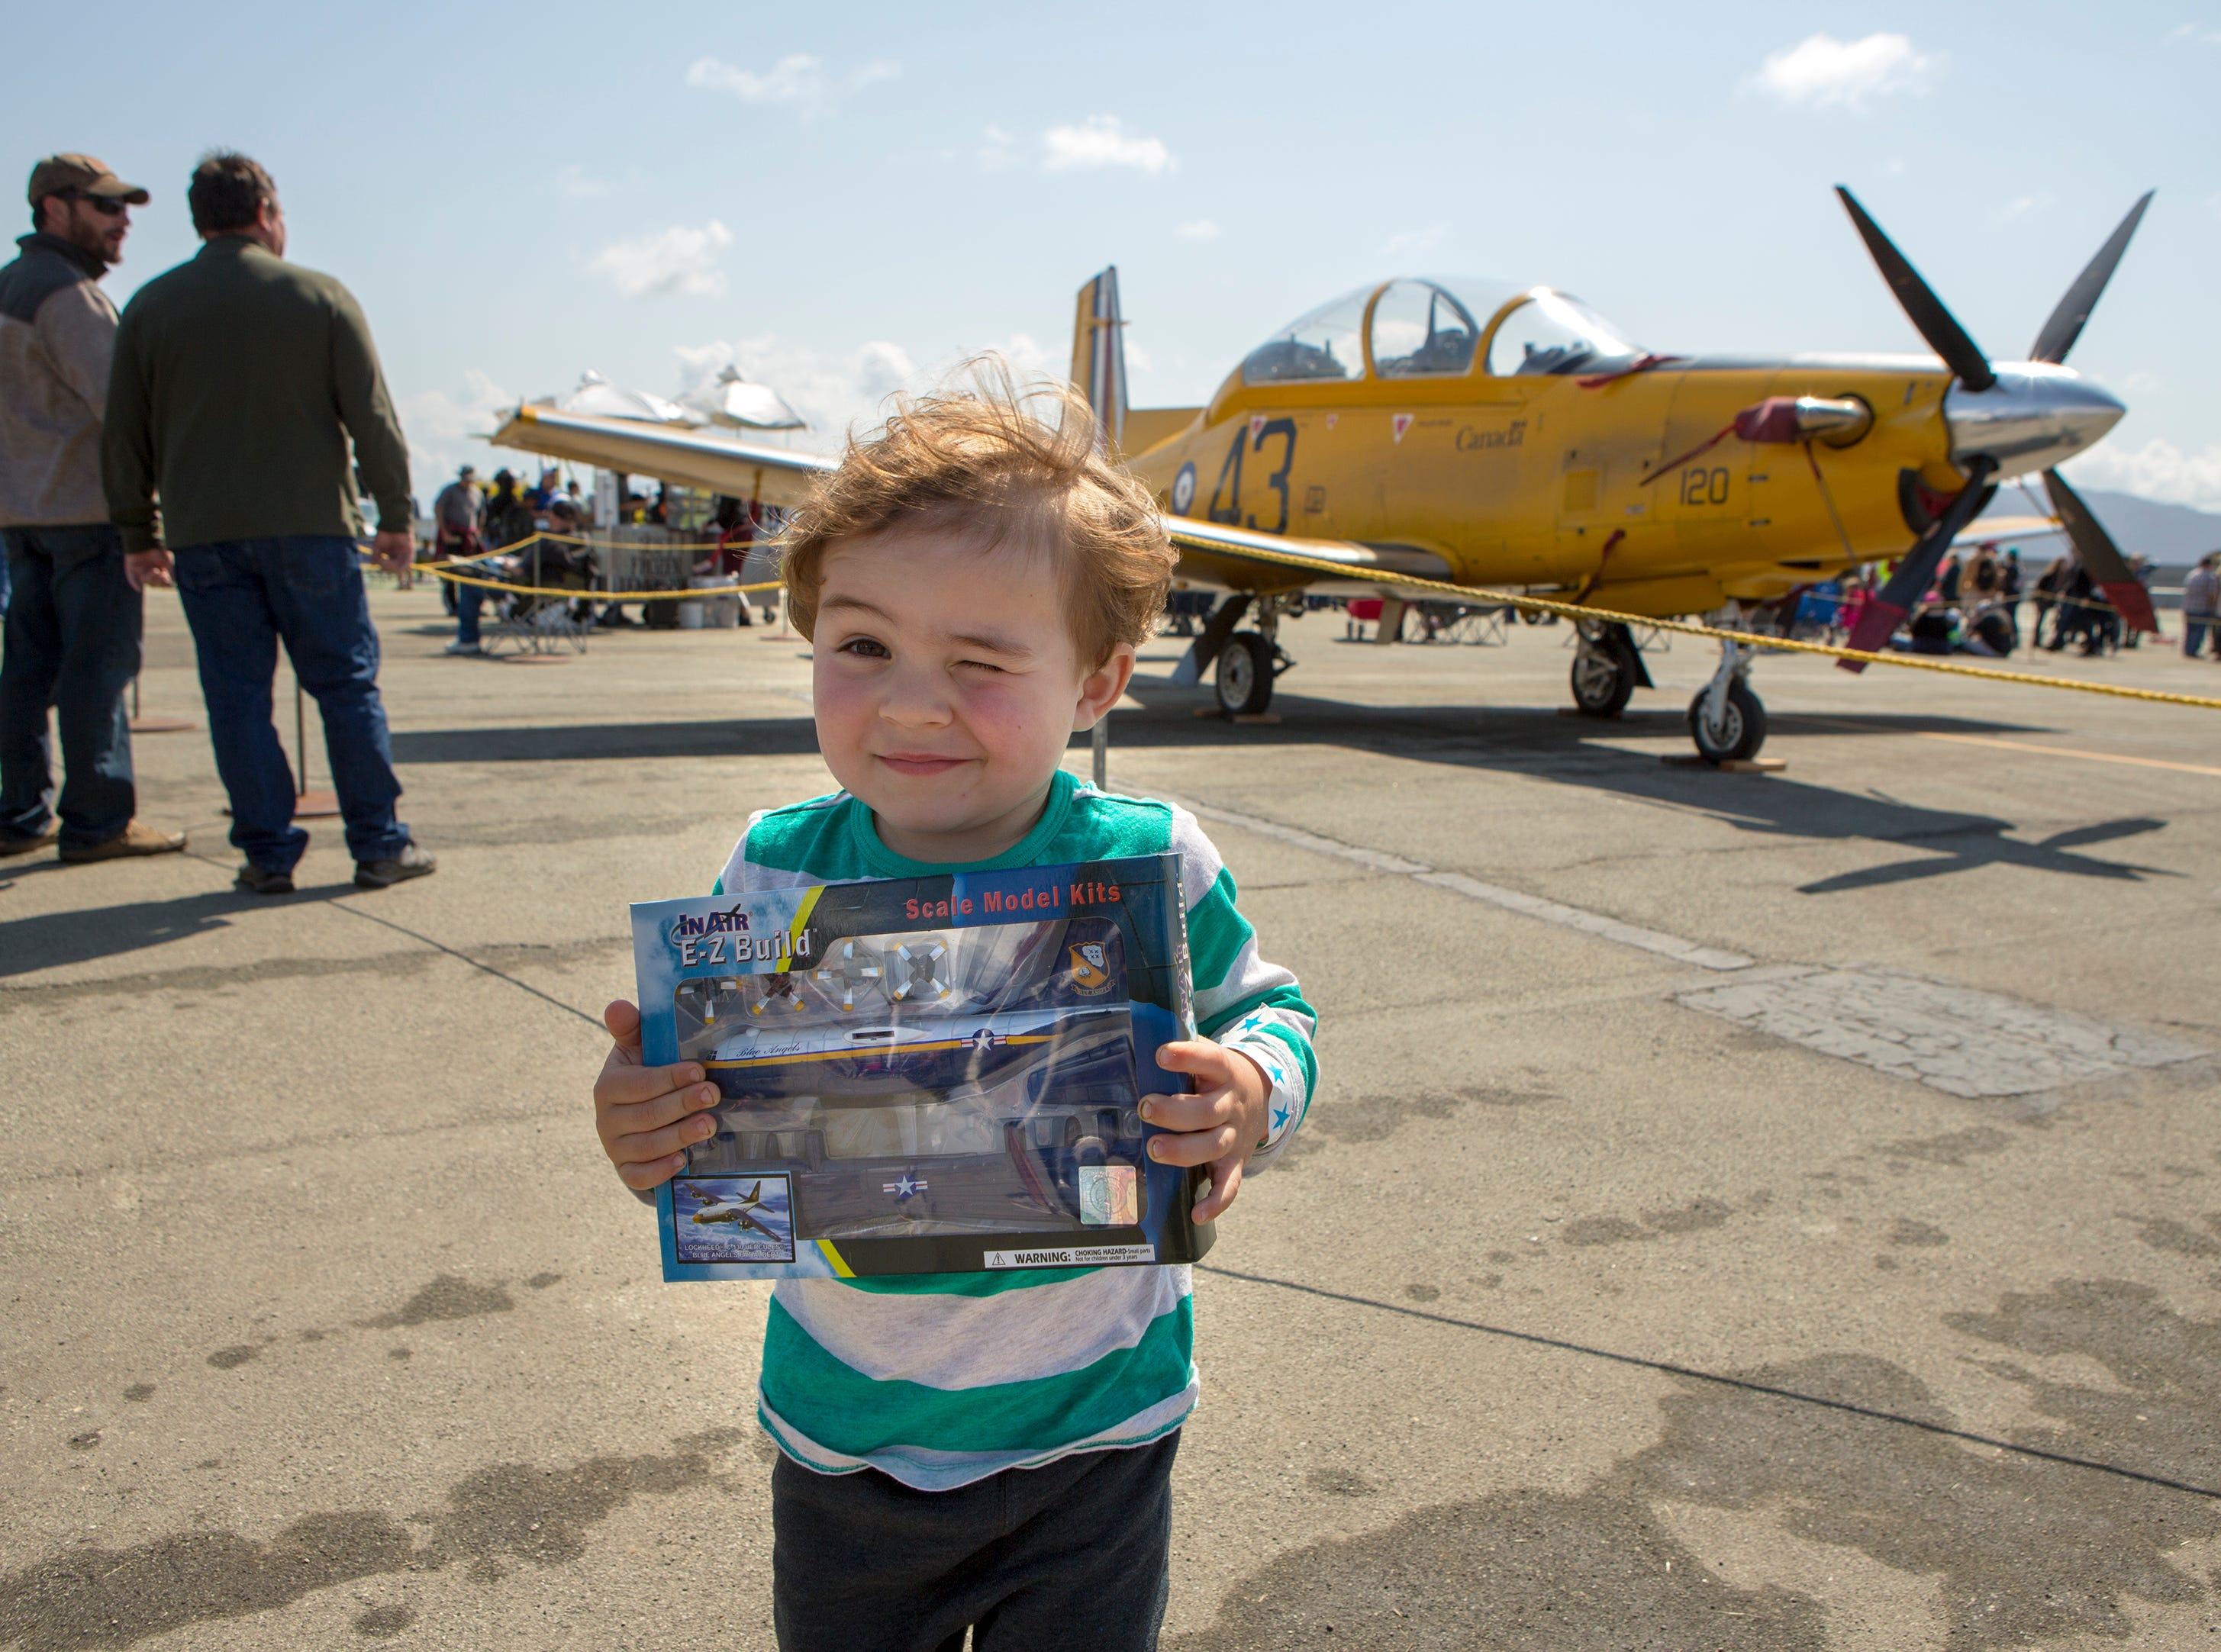 Andersen Hubbard, 3, of Salinas holds a model plane of the Blue Angels Fat Albert C-130 at the California International Airshow Salinas at the Salinas Airport on March 23, 2019. (Photo by David Royal)